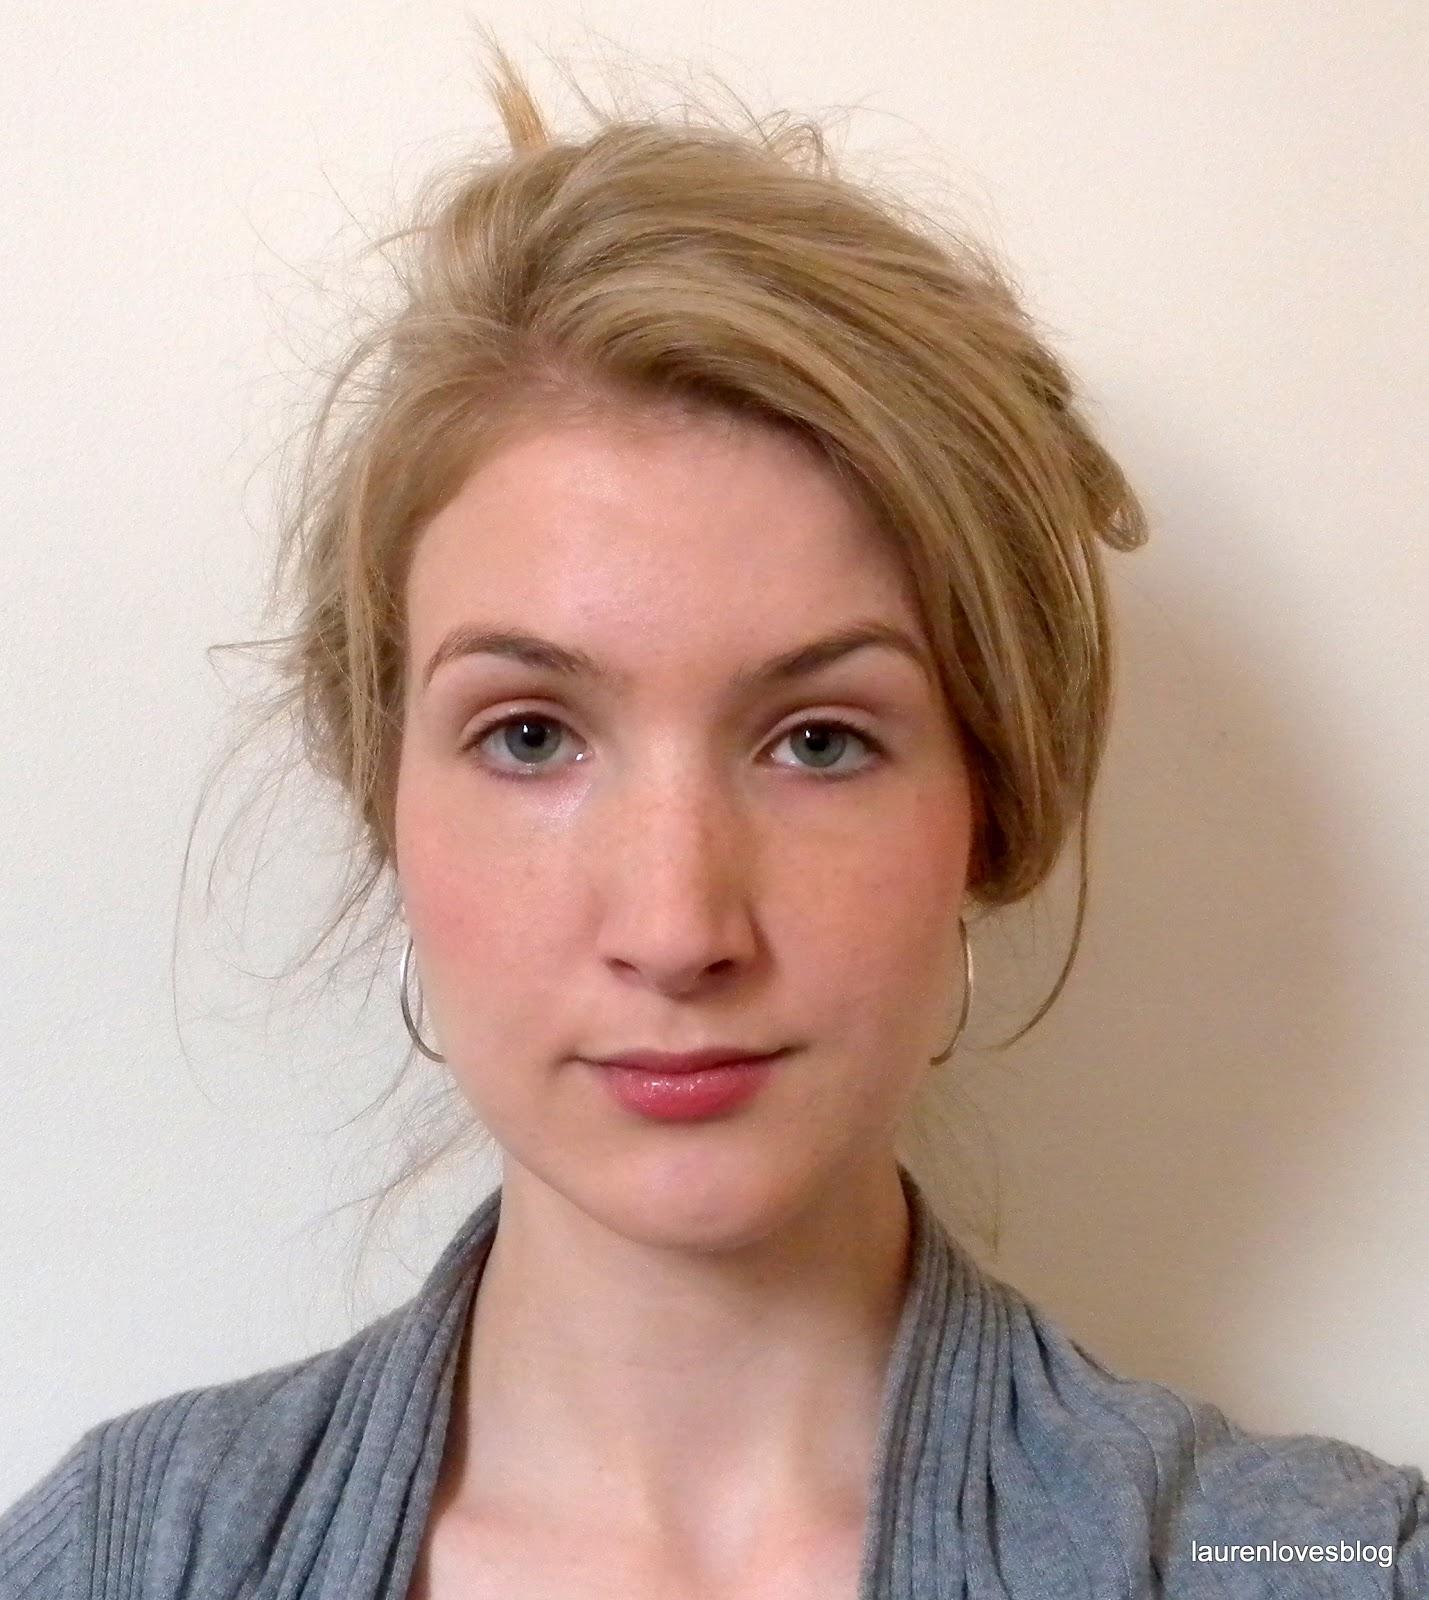 How To Make Your Eyes Look Bigger Using Makeup Lauren Loves Blog